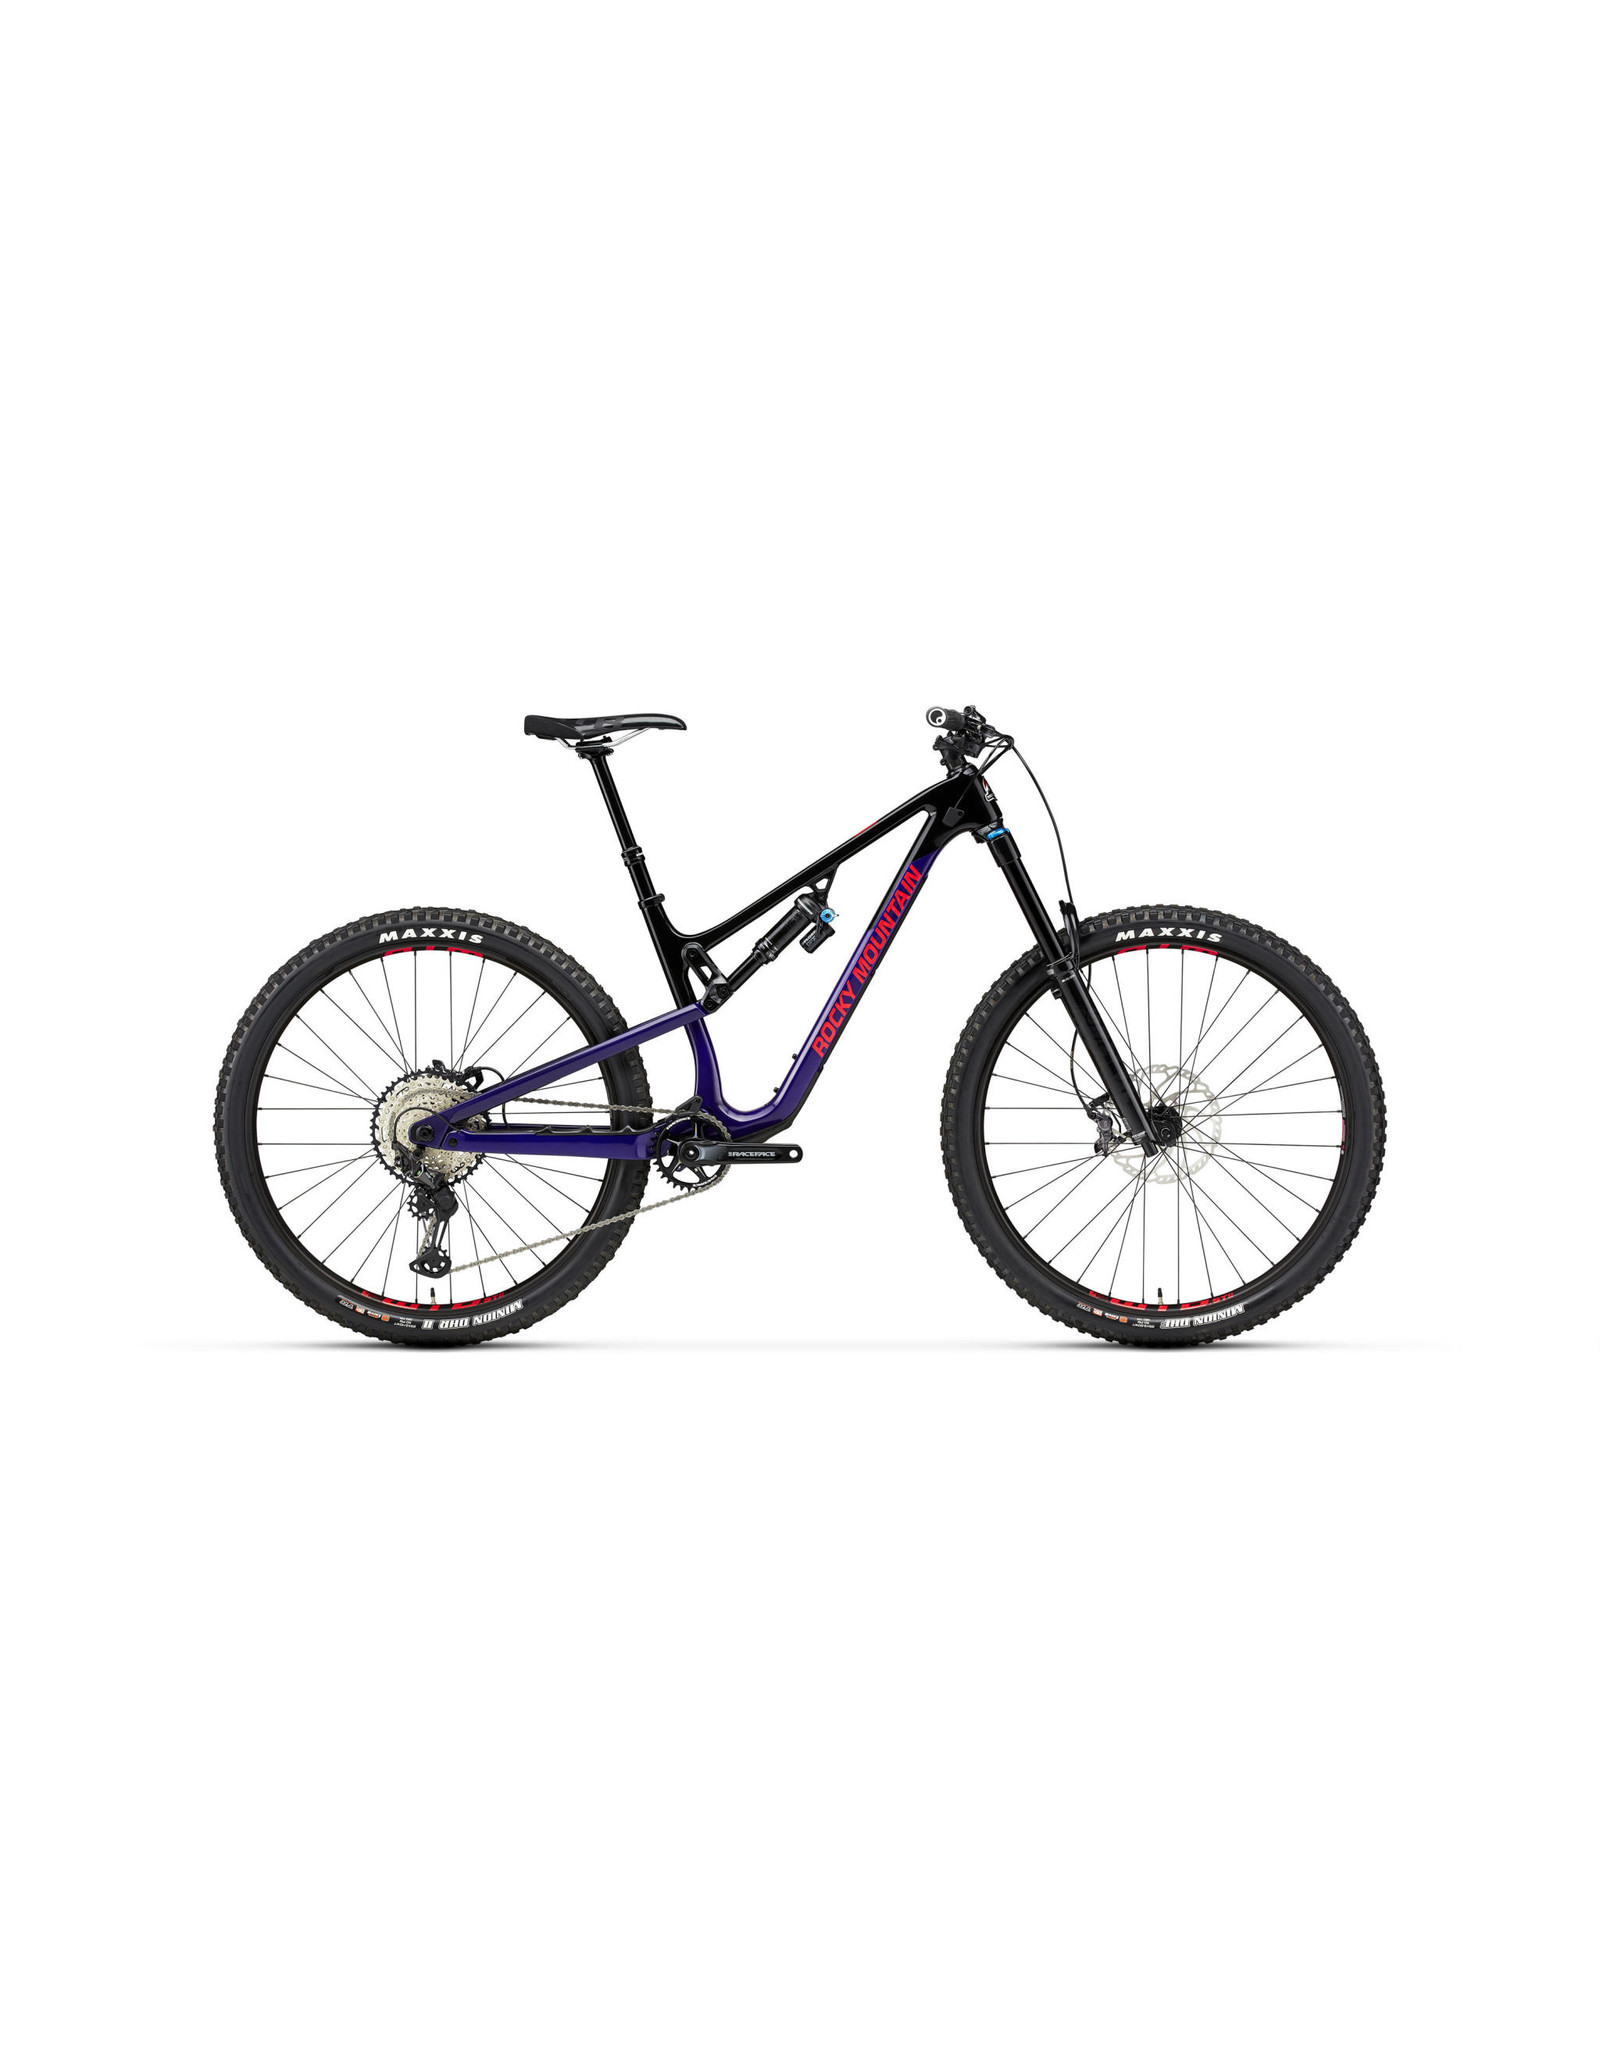 ROCKY MOUNTAIN 2021 Altitude C50 large black/purple